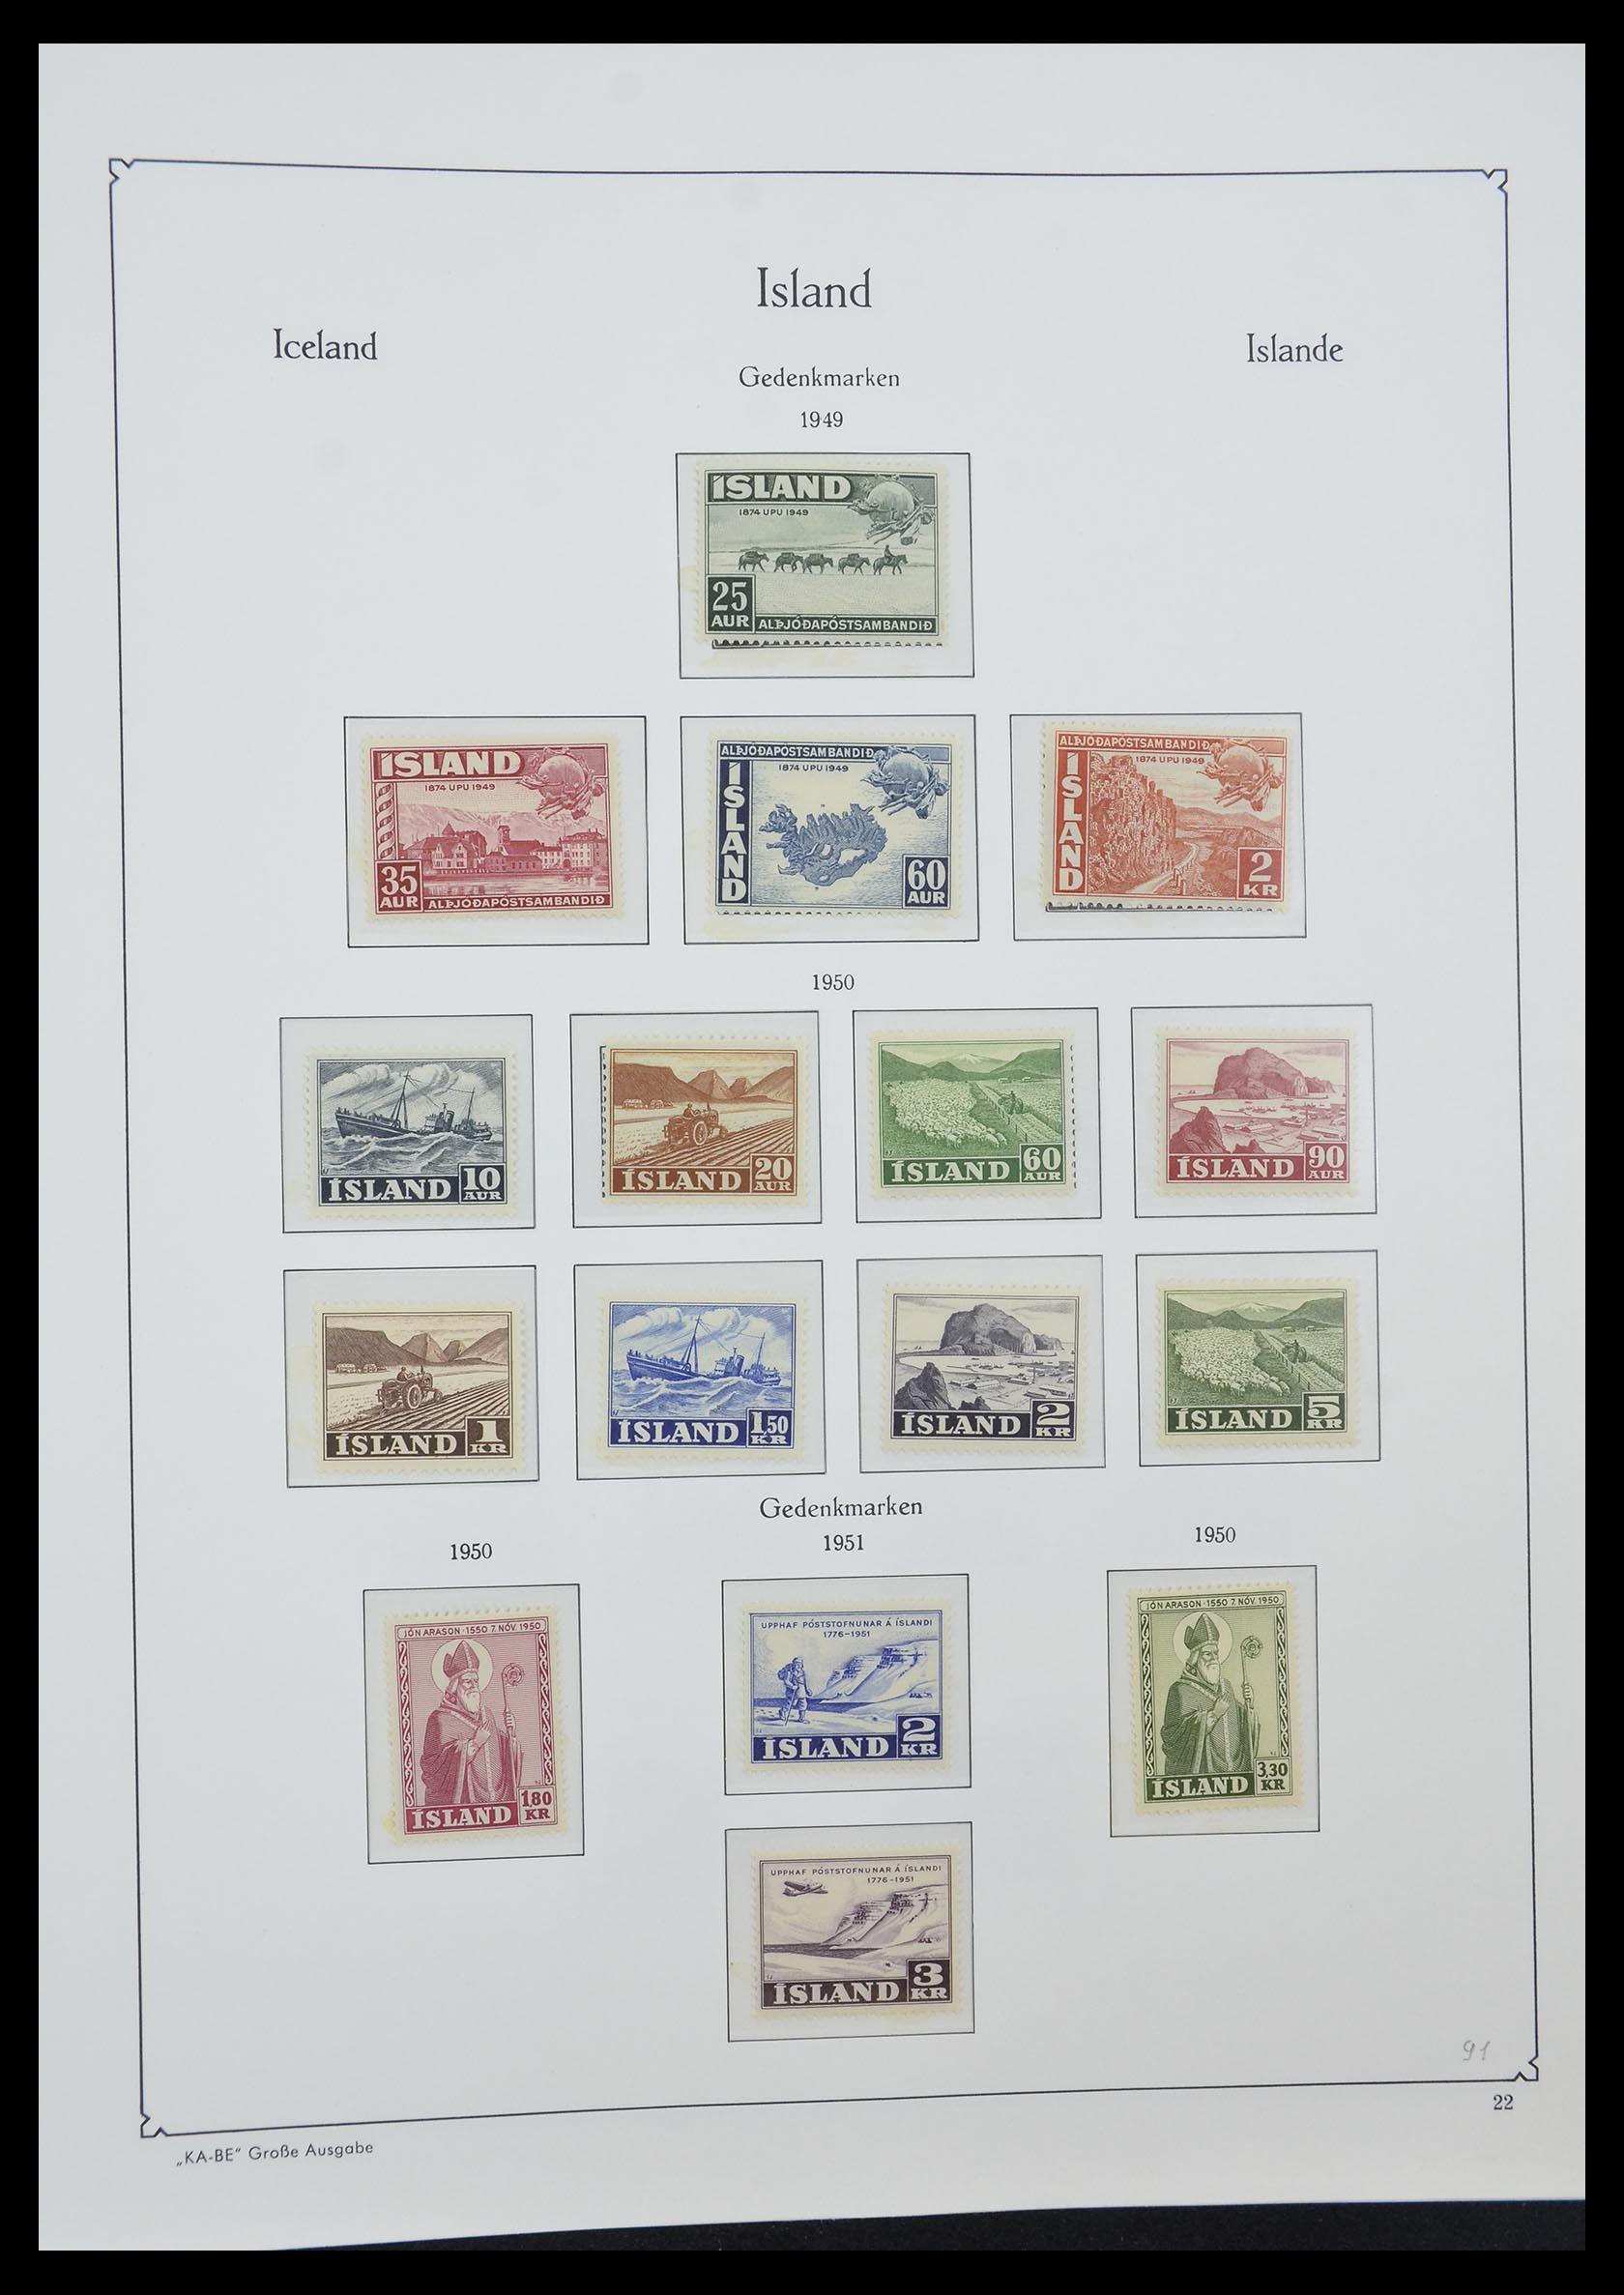 33185 005 - Postzegelverzameling 33184 Finland 1856-1990.